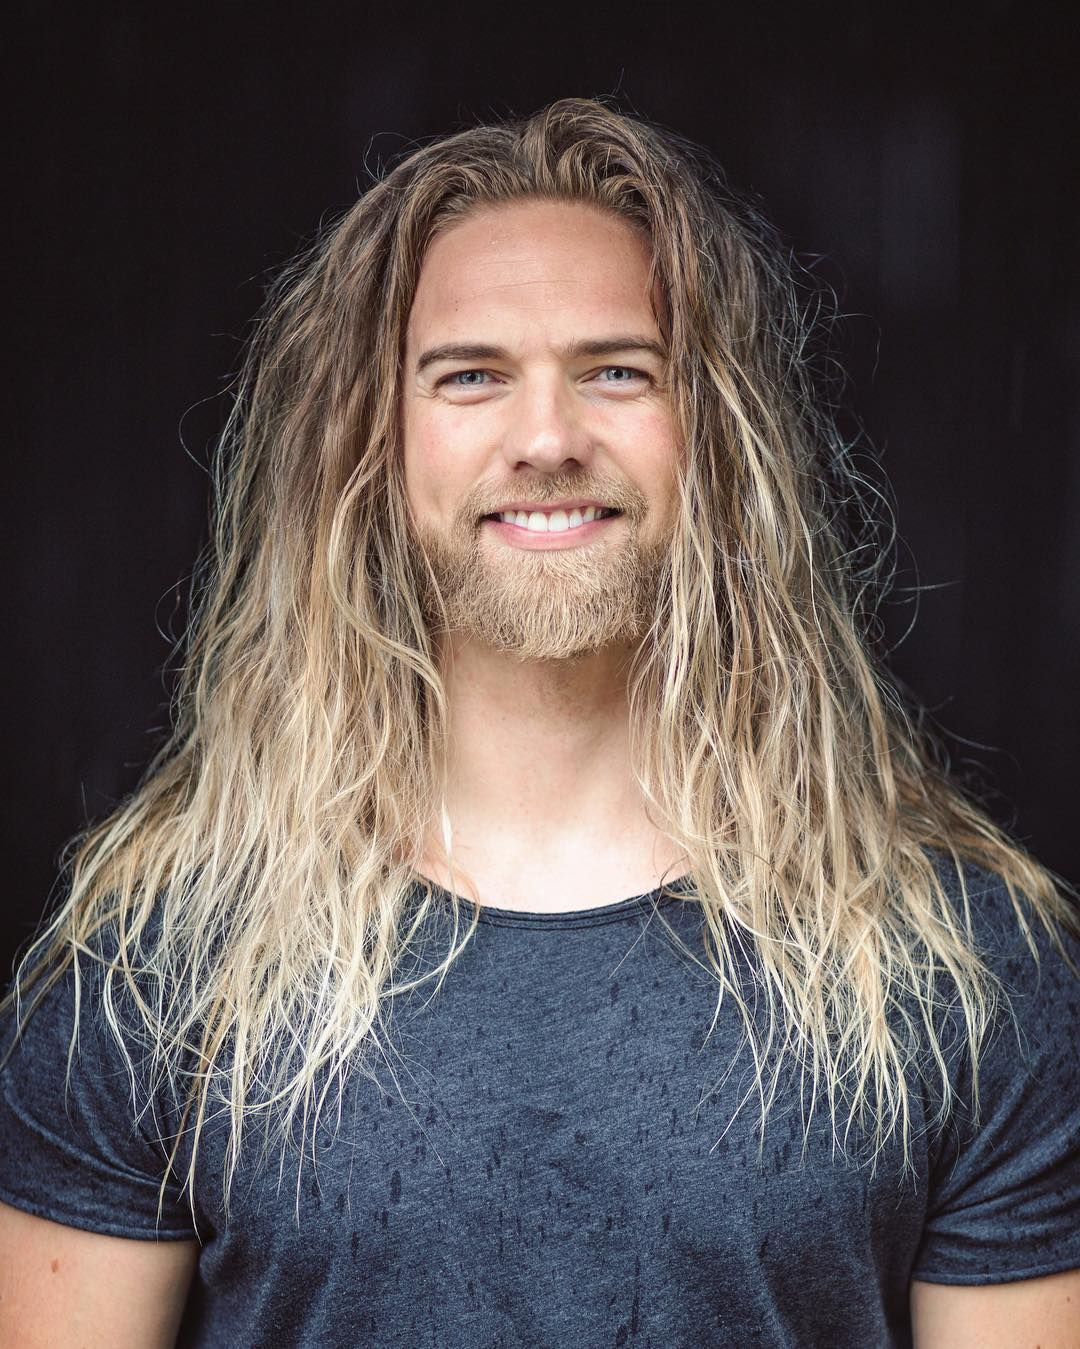 Lasse Matberg sexy hot dads dudes men long-hair